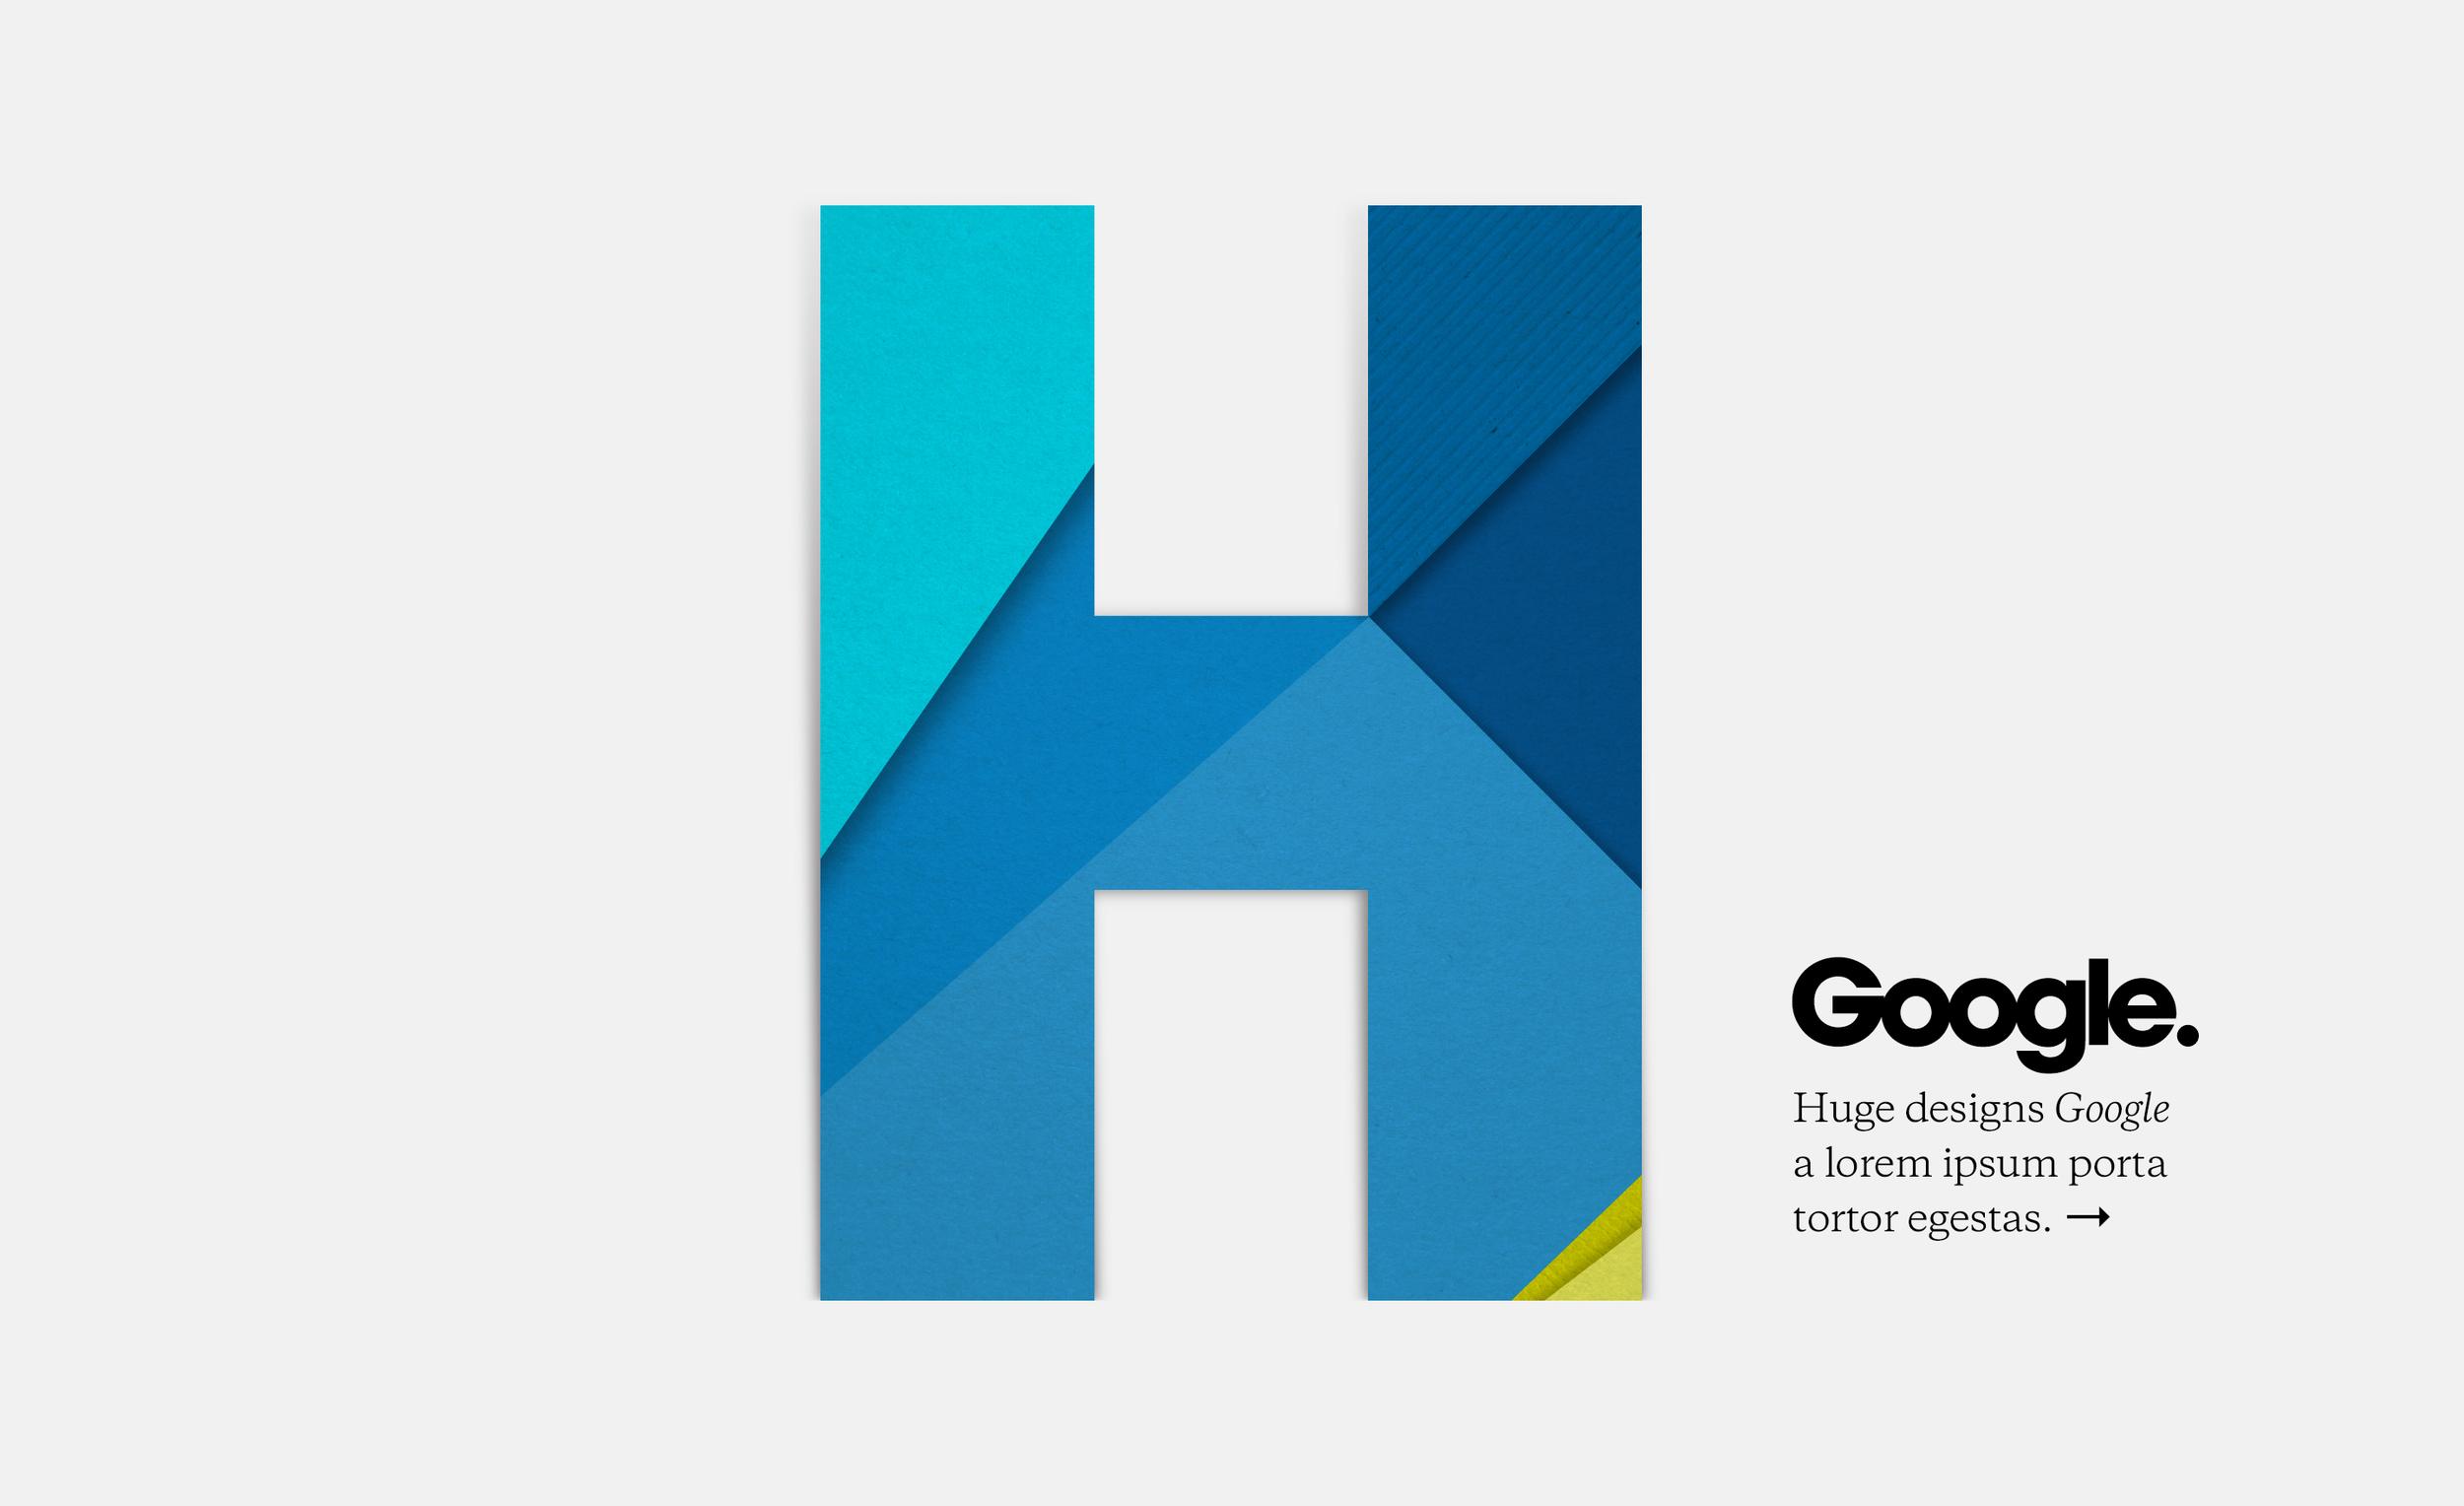 H_Google_02.jpg